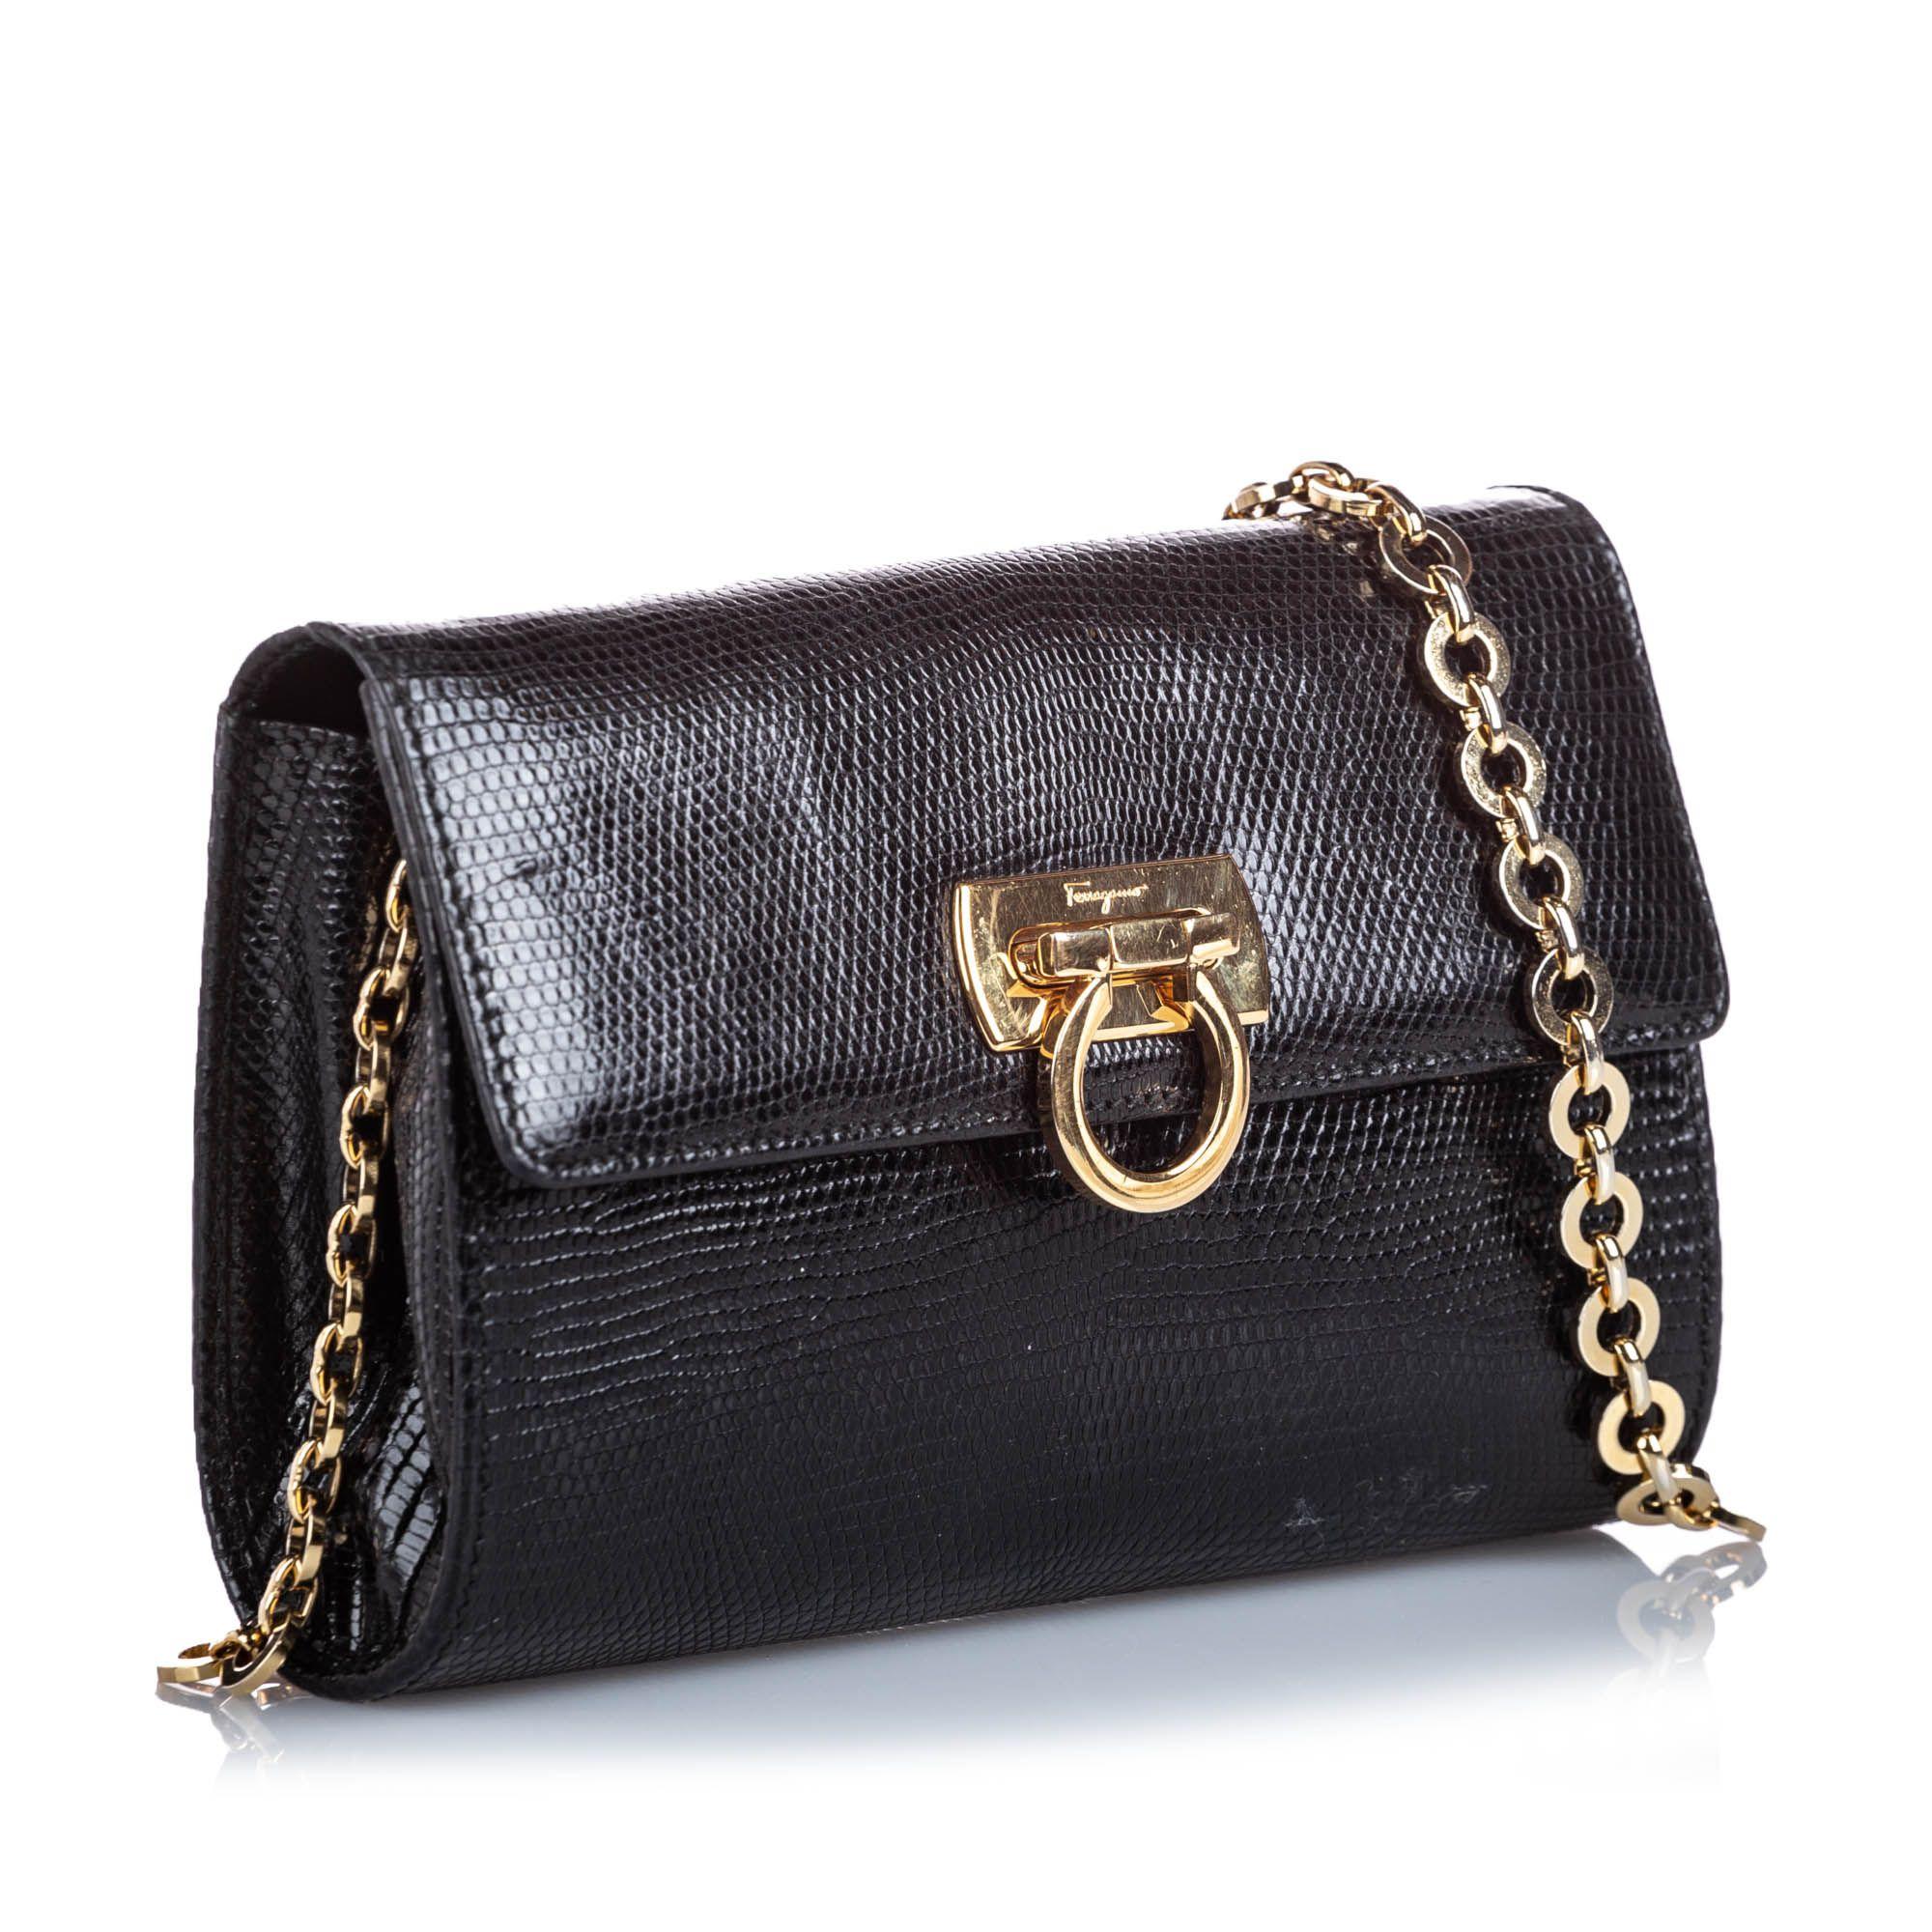 Vintage Ferragamo Lizard Leather Norina Black